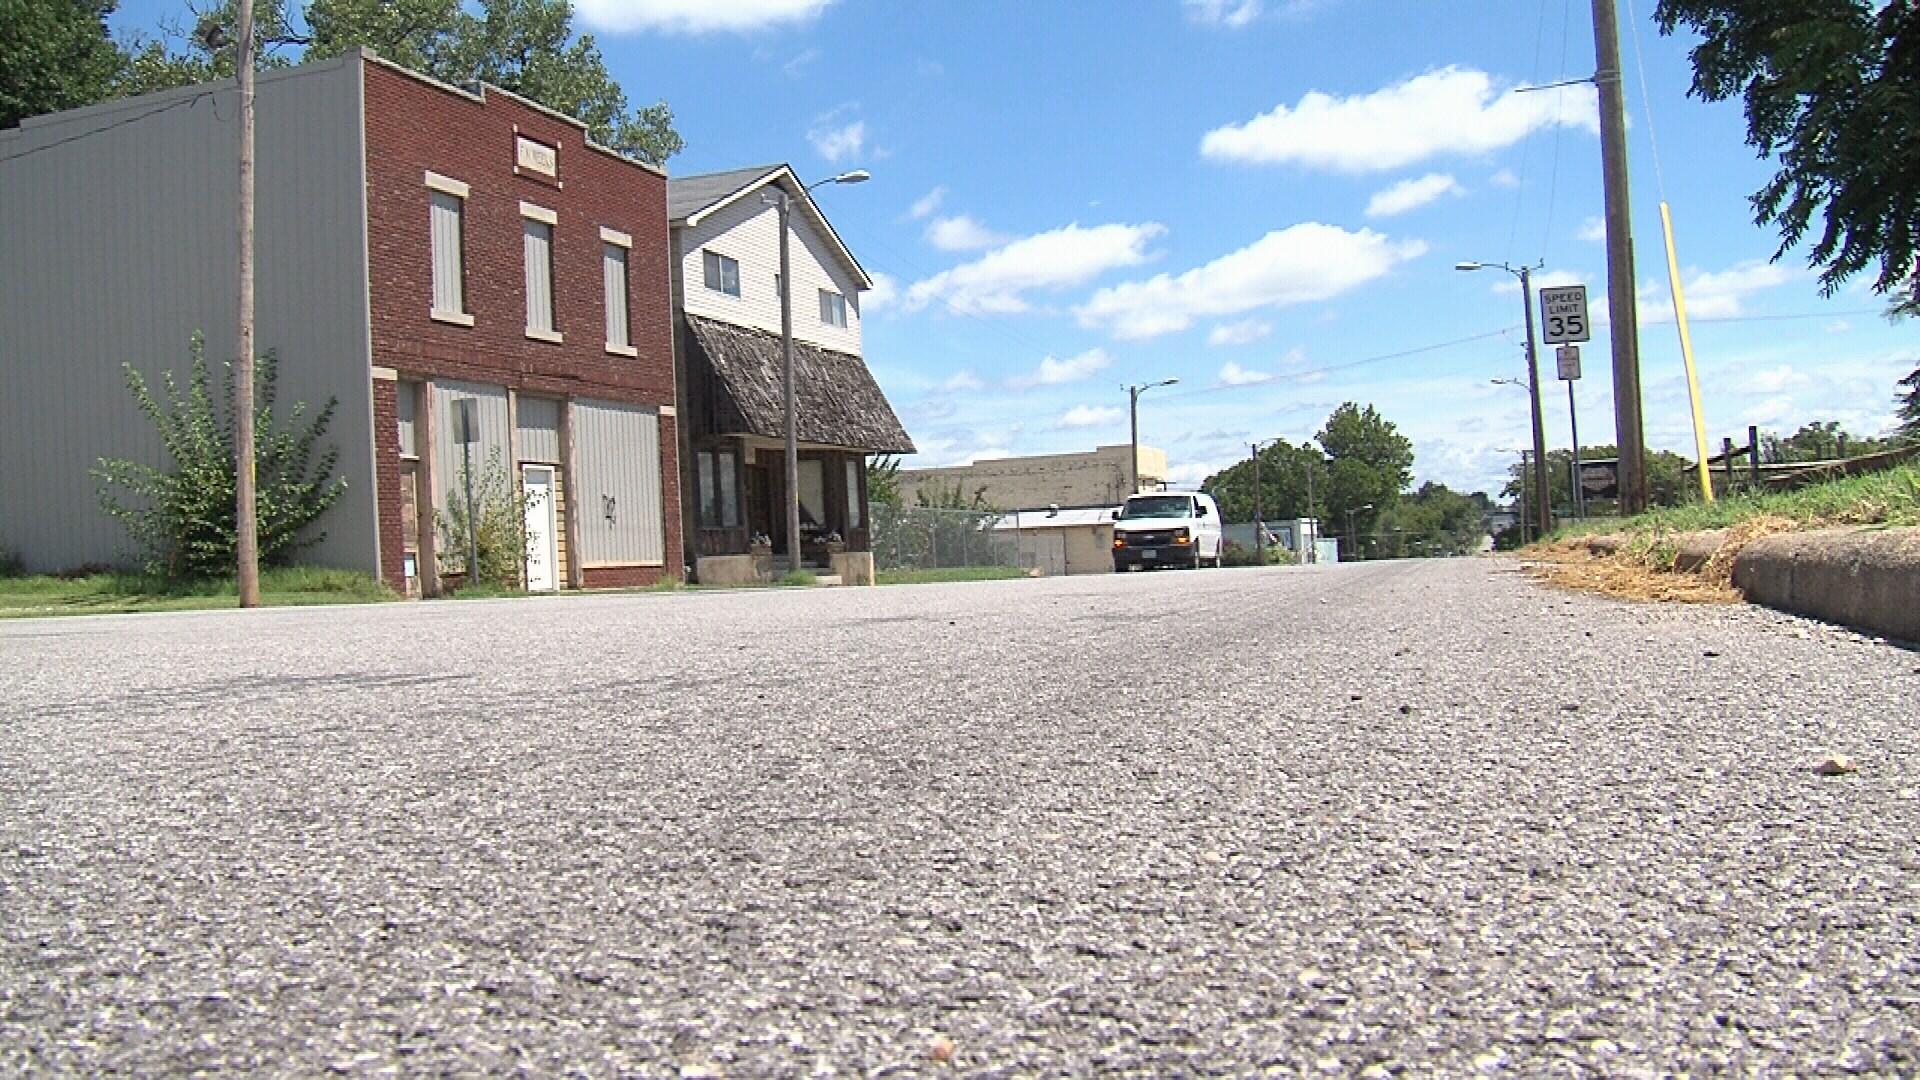 Joplin's original main street